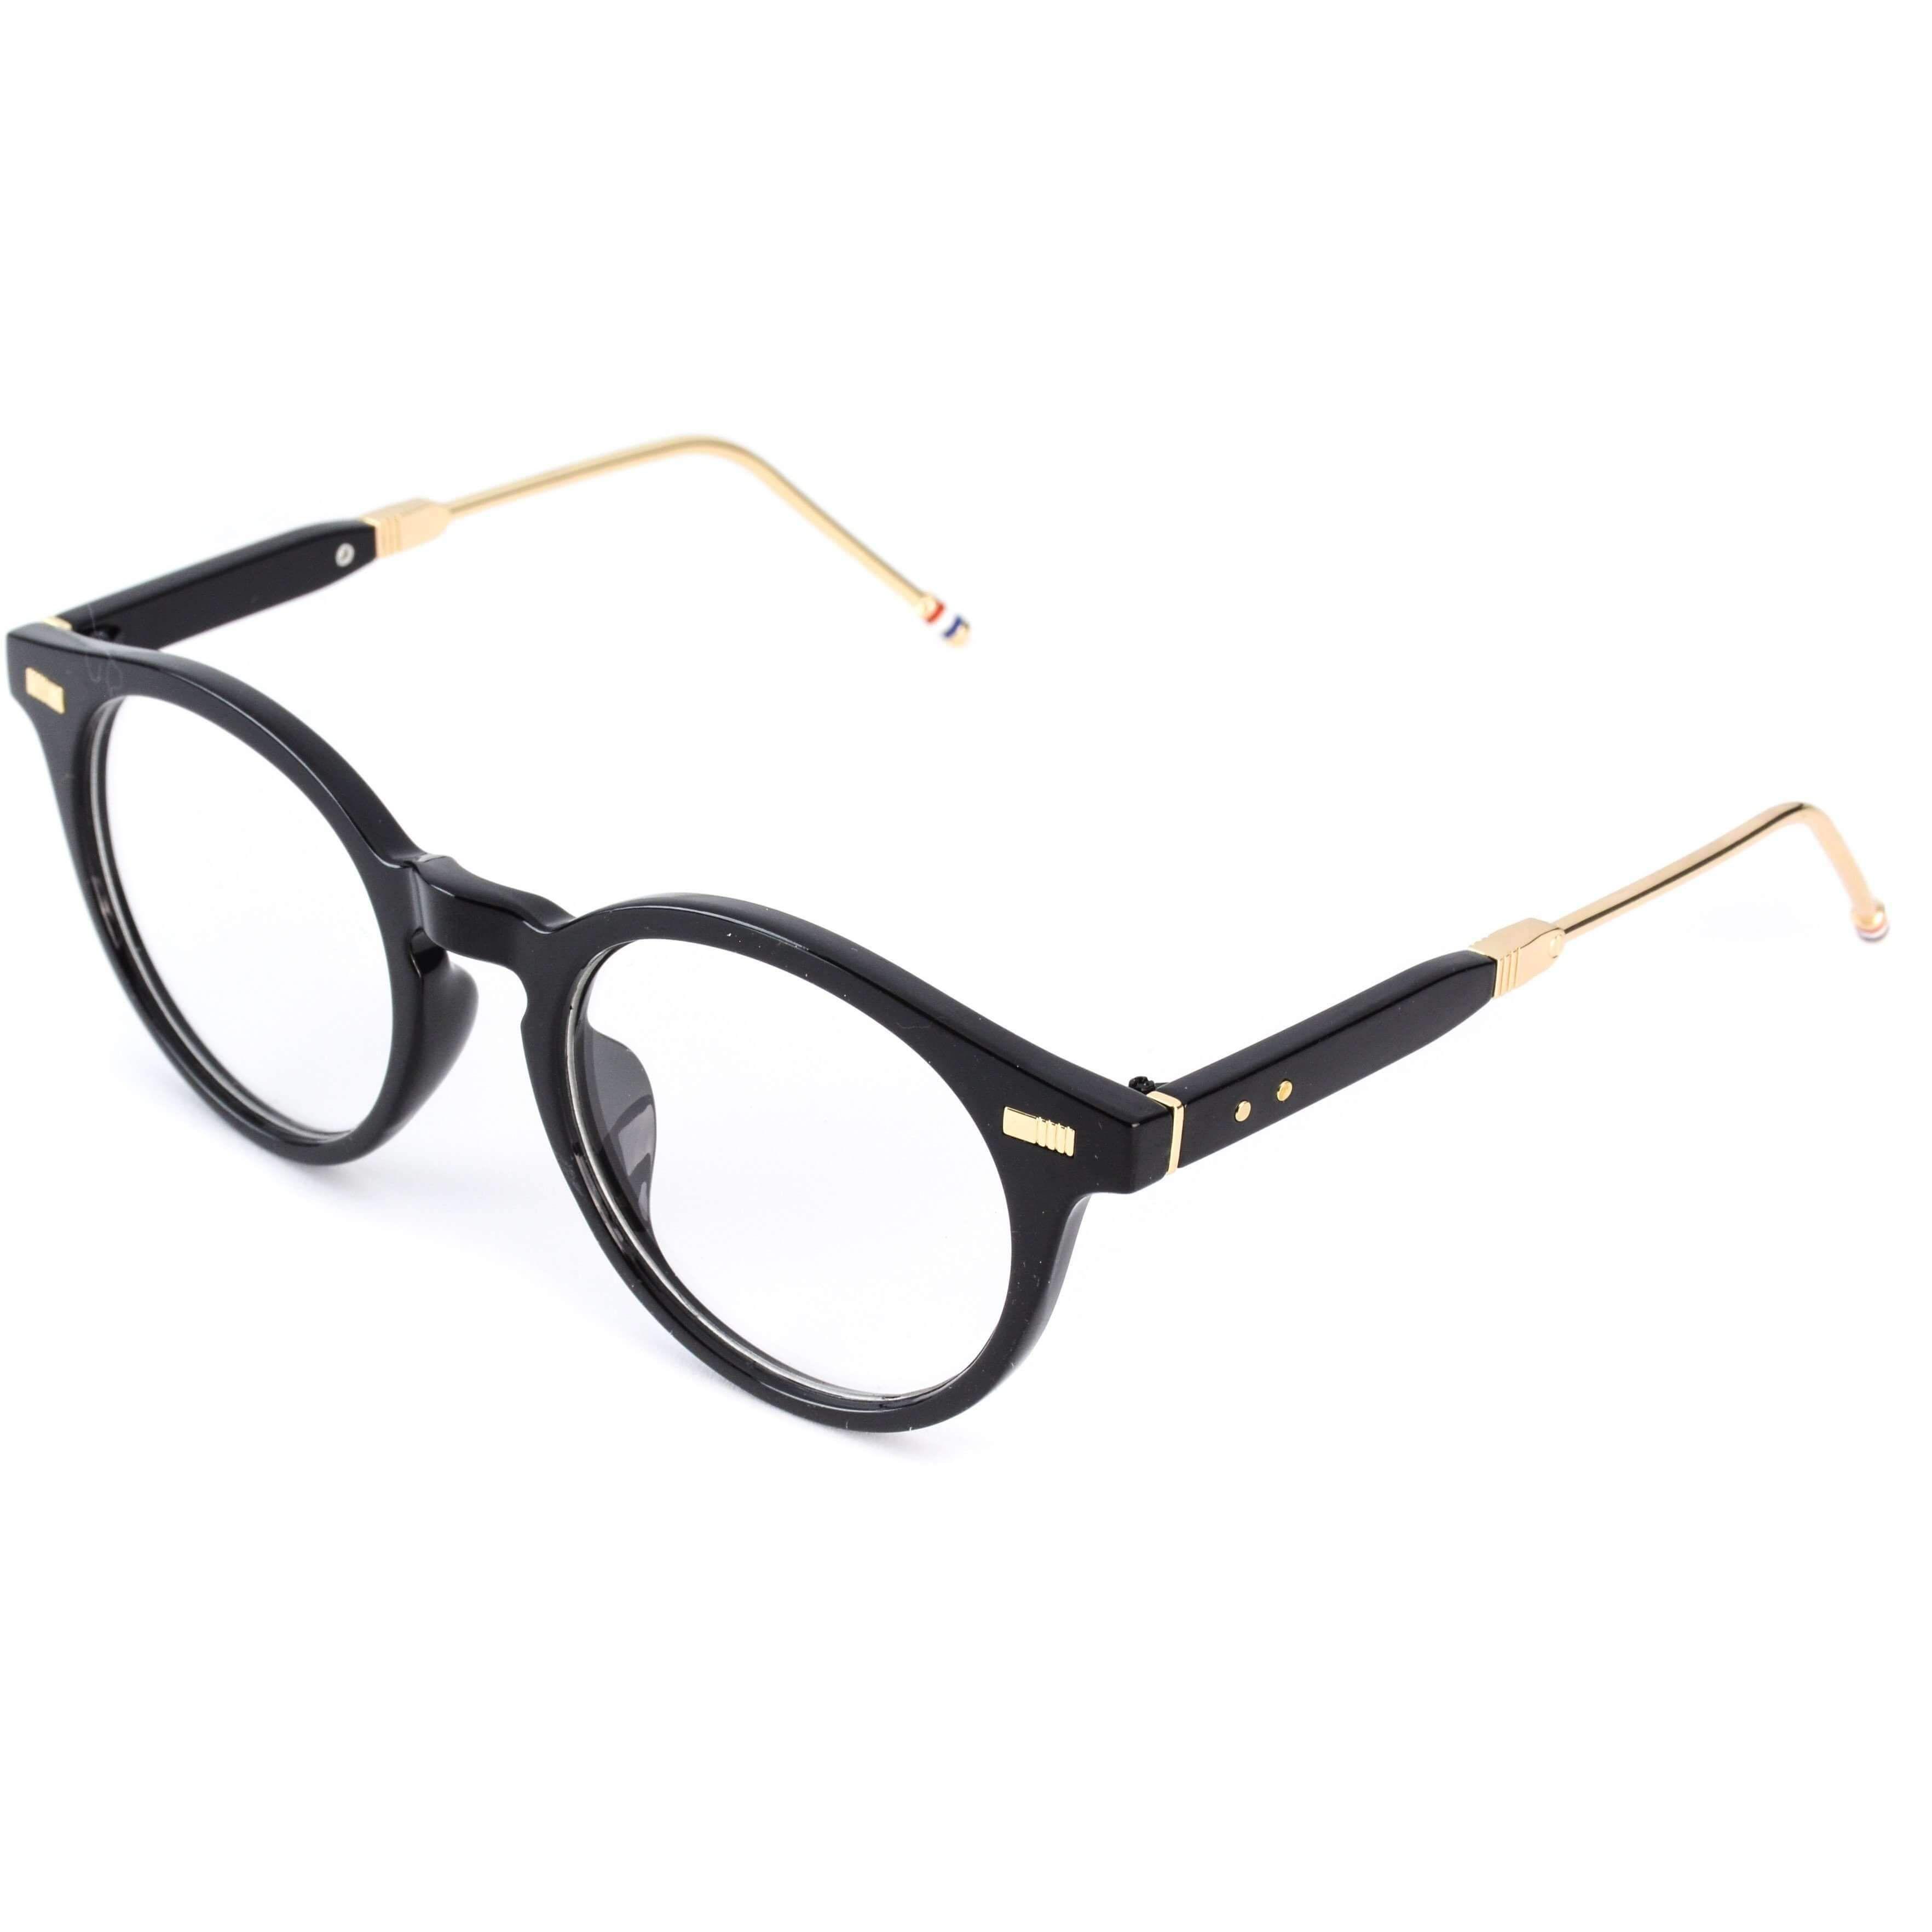 Becca Elegant Round Thick Frame Designer Glasses   Optical frames ...